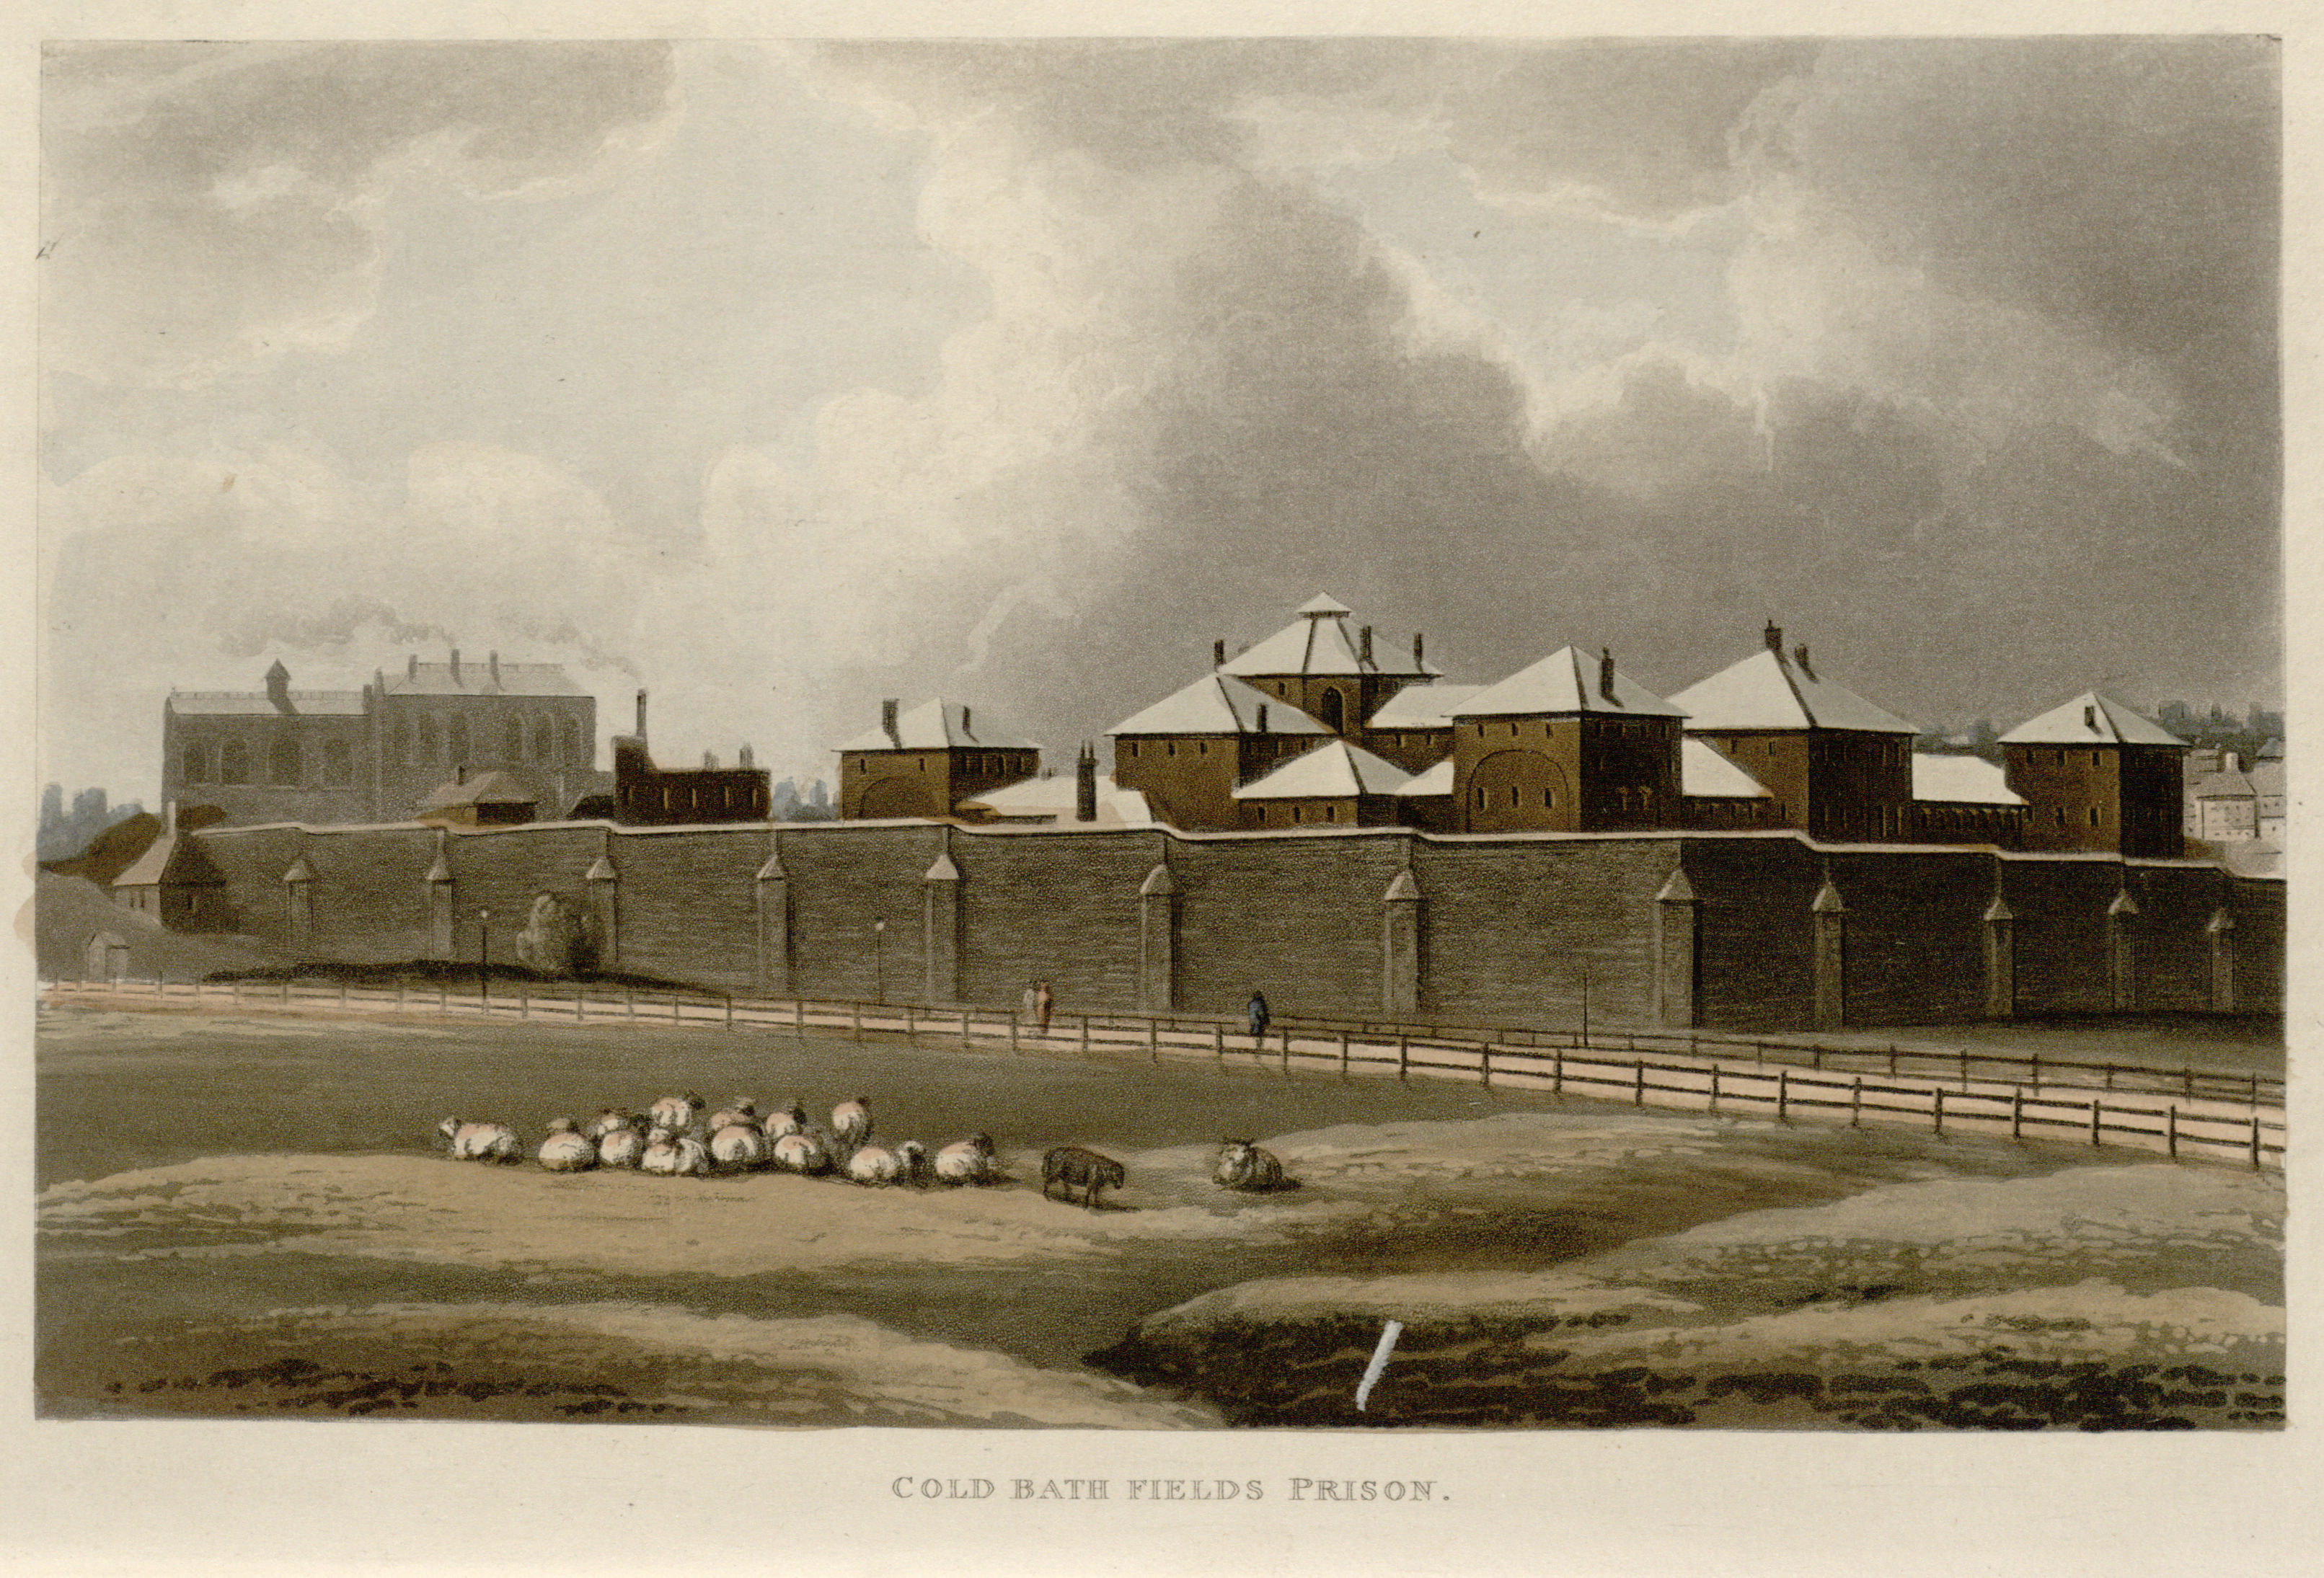 76 - Papworth - Cold Bath Fields Prison